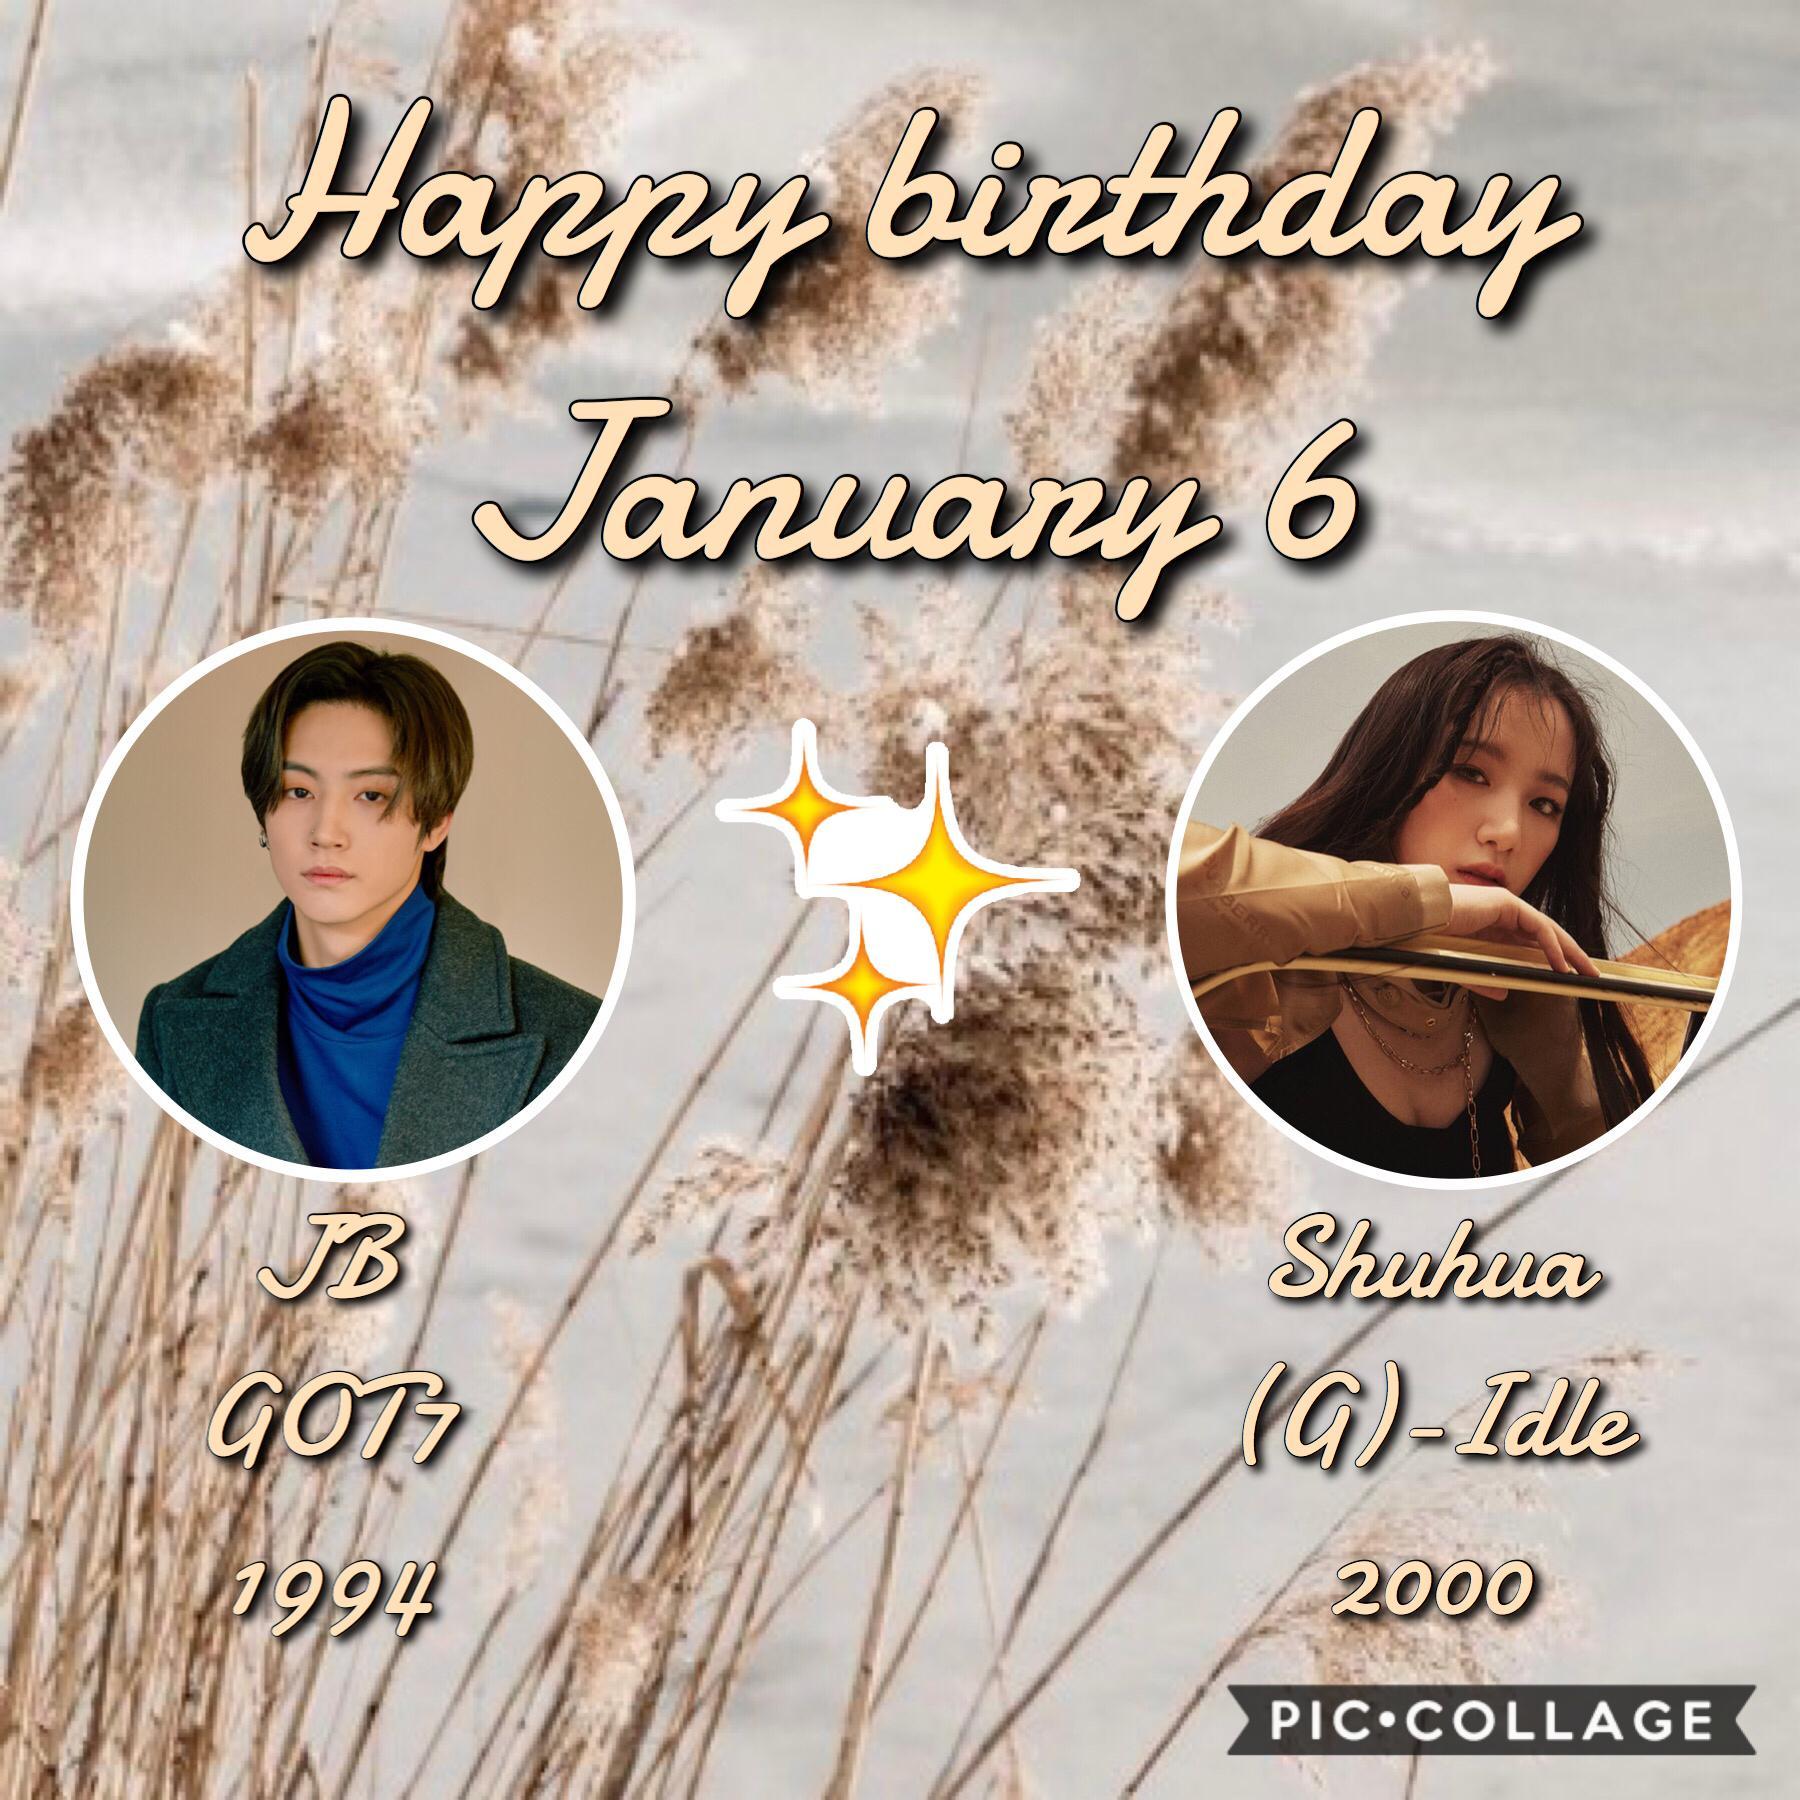 •🎈❄️• Birthdays coming up: •CLC's Eunbin~Jan 6 •AOA's Jimin~ Jan 8 •EXID's Solji~ Jan 10 •JBJ95's Kenta~Jan 10 •ONEUS's Xion~Jan 10 •Iz*One's Chaeyeon~ Jan 11 ☃️❄️~Whoop~❄️☃️